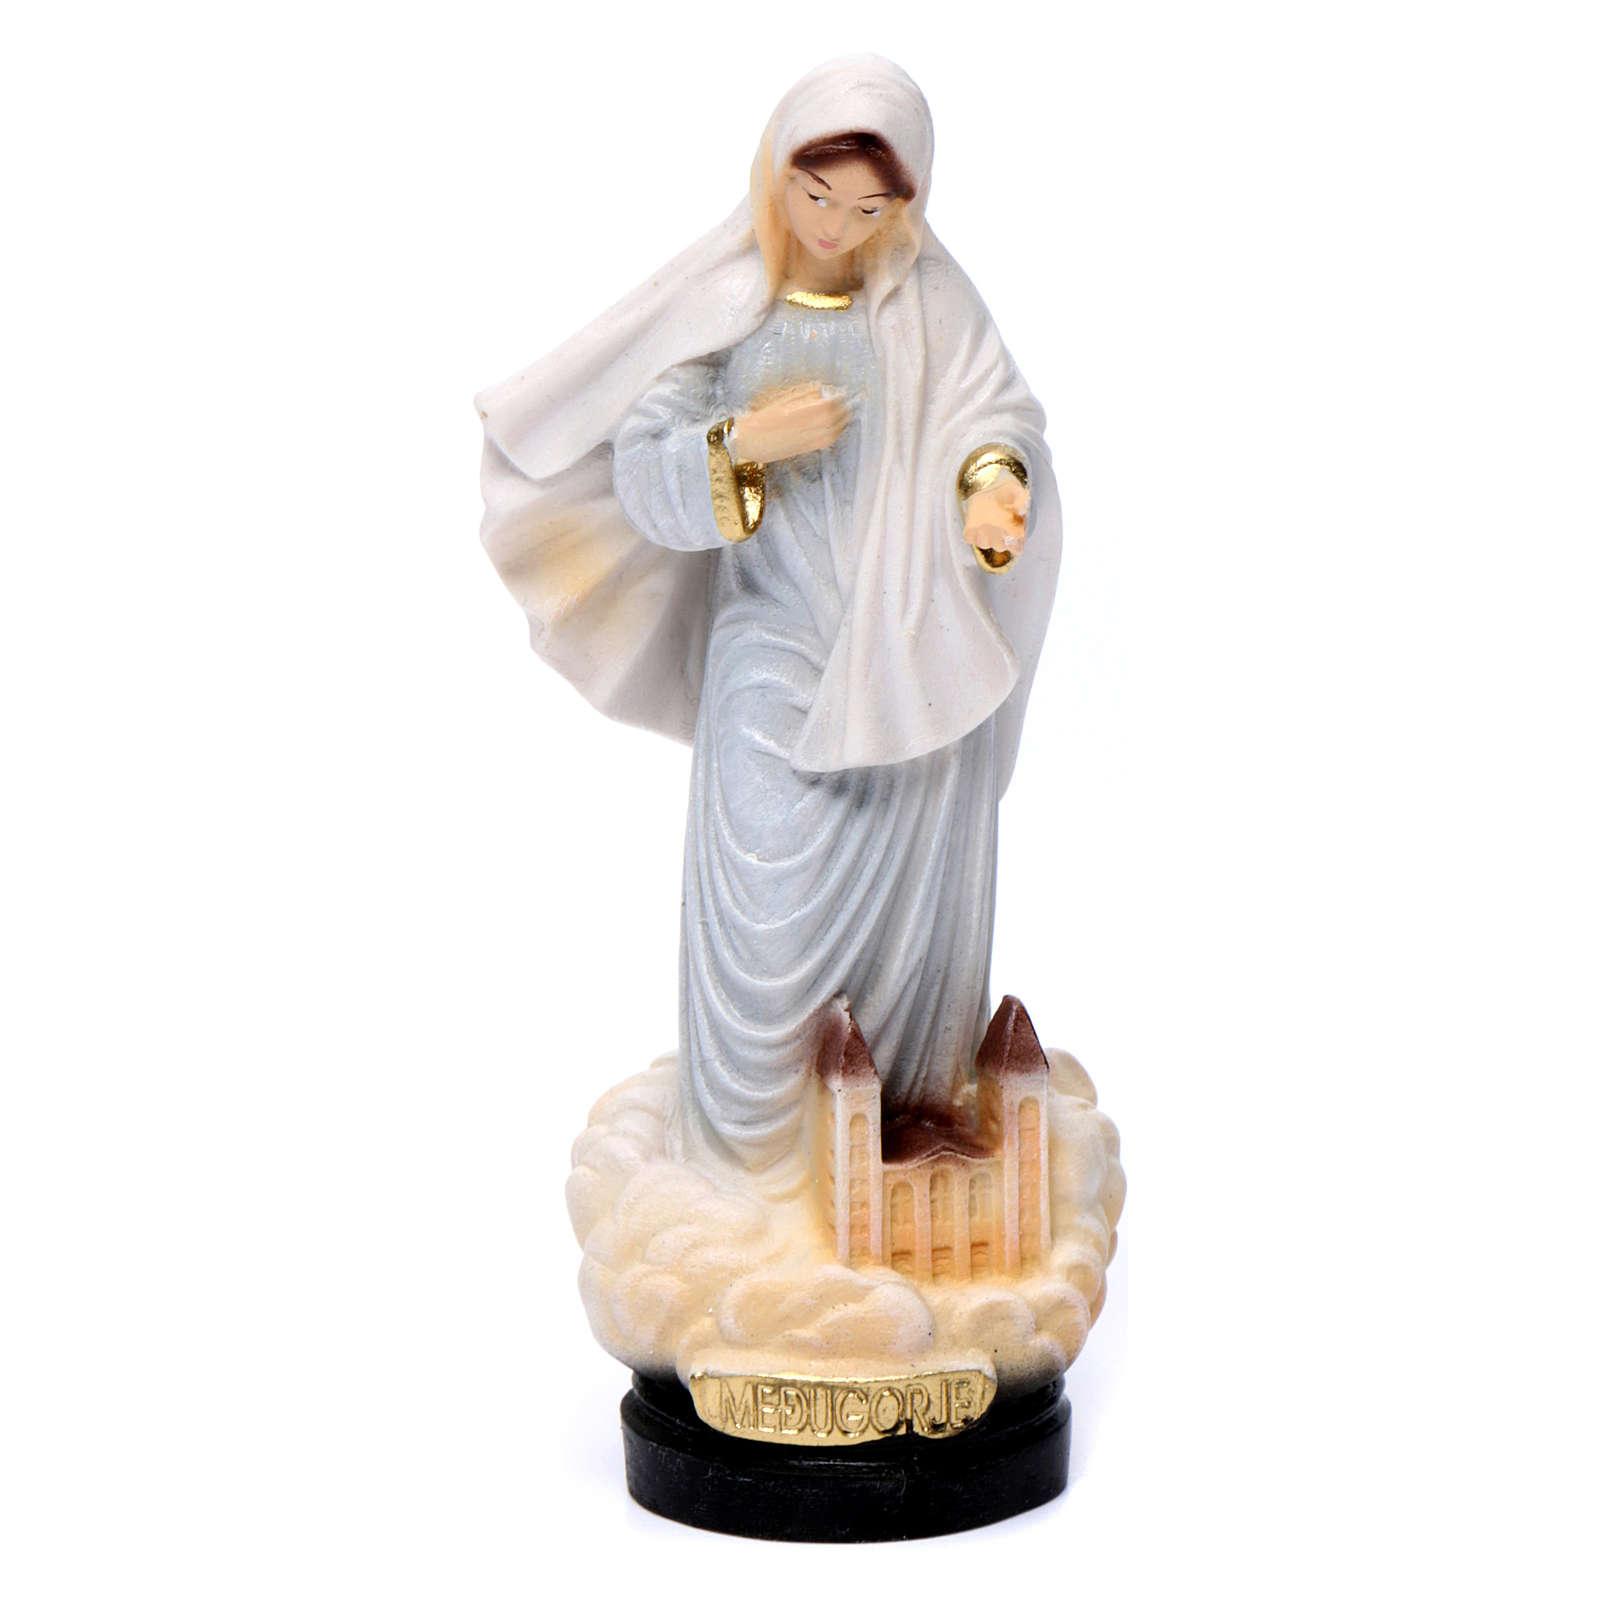 Estatua Virgen de Medjugorje 12 cm capa gris 4